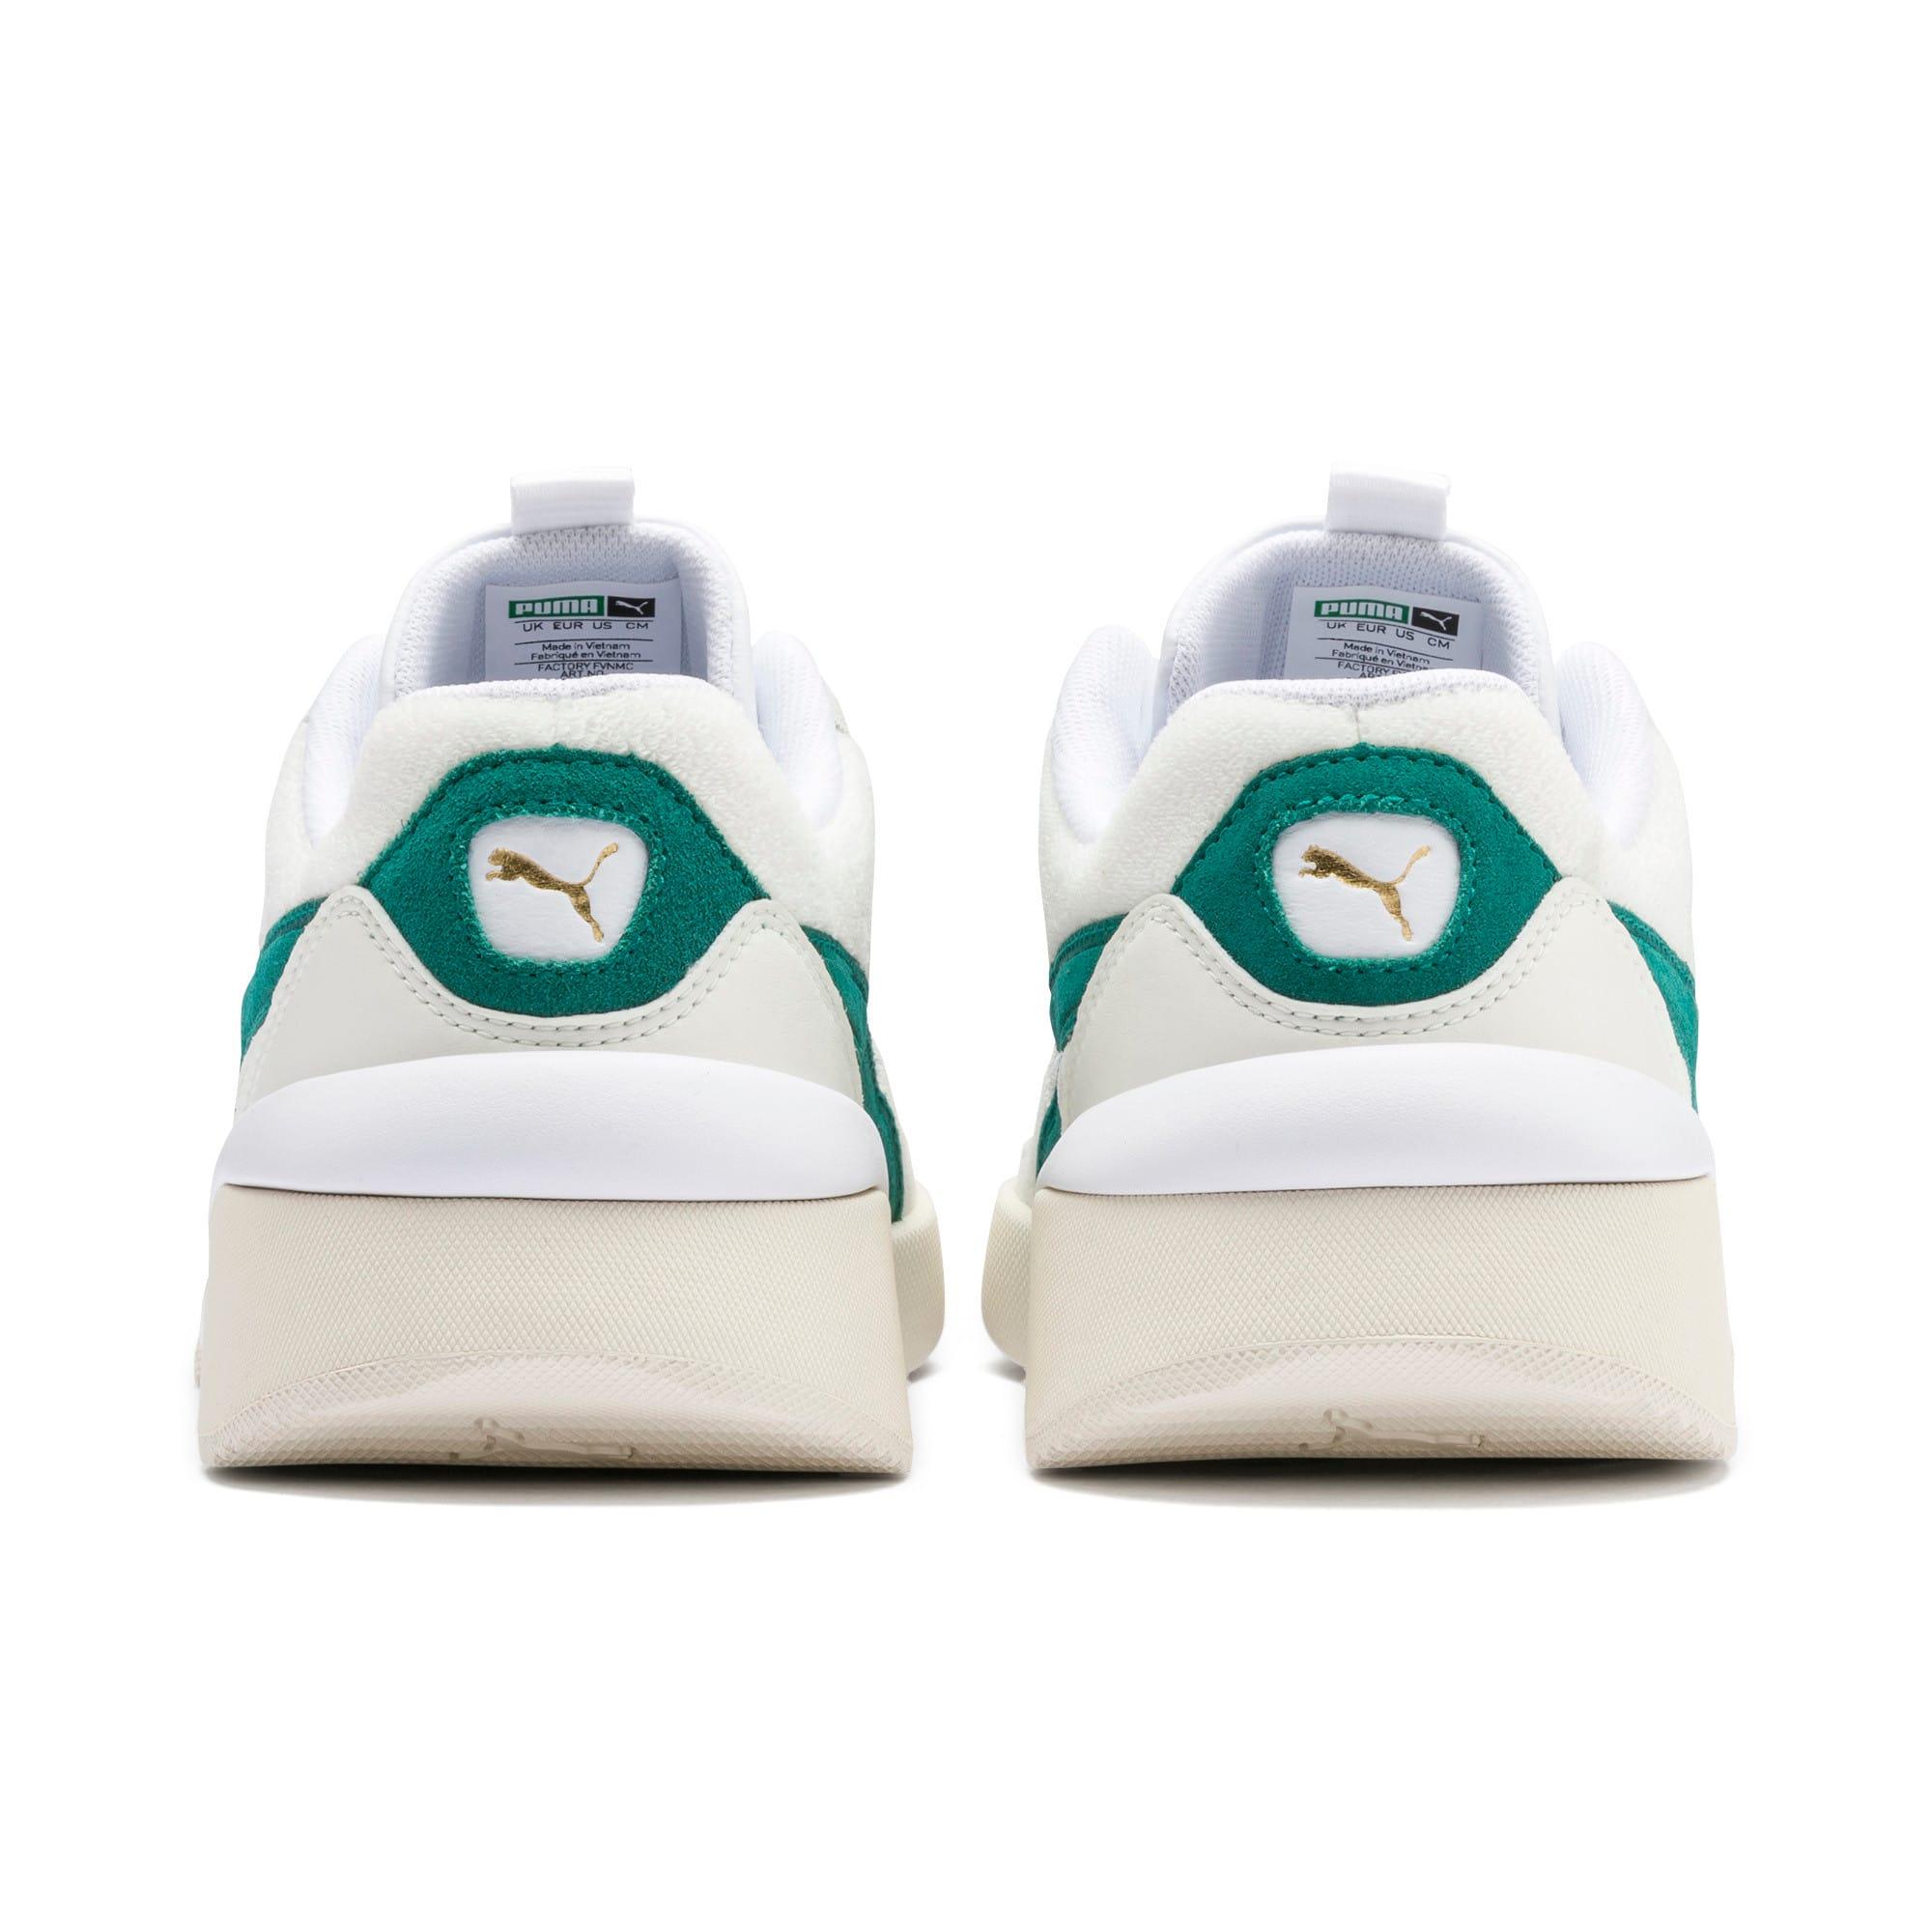 Thumbnail 4 of Aeon Heritage Women's Sneakers, Puma White-Teal Green, medium